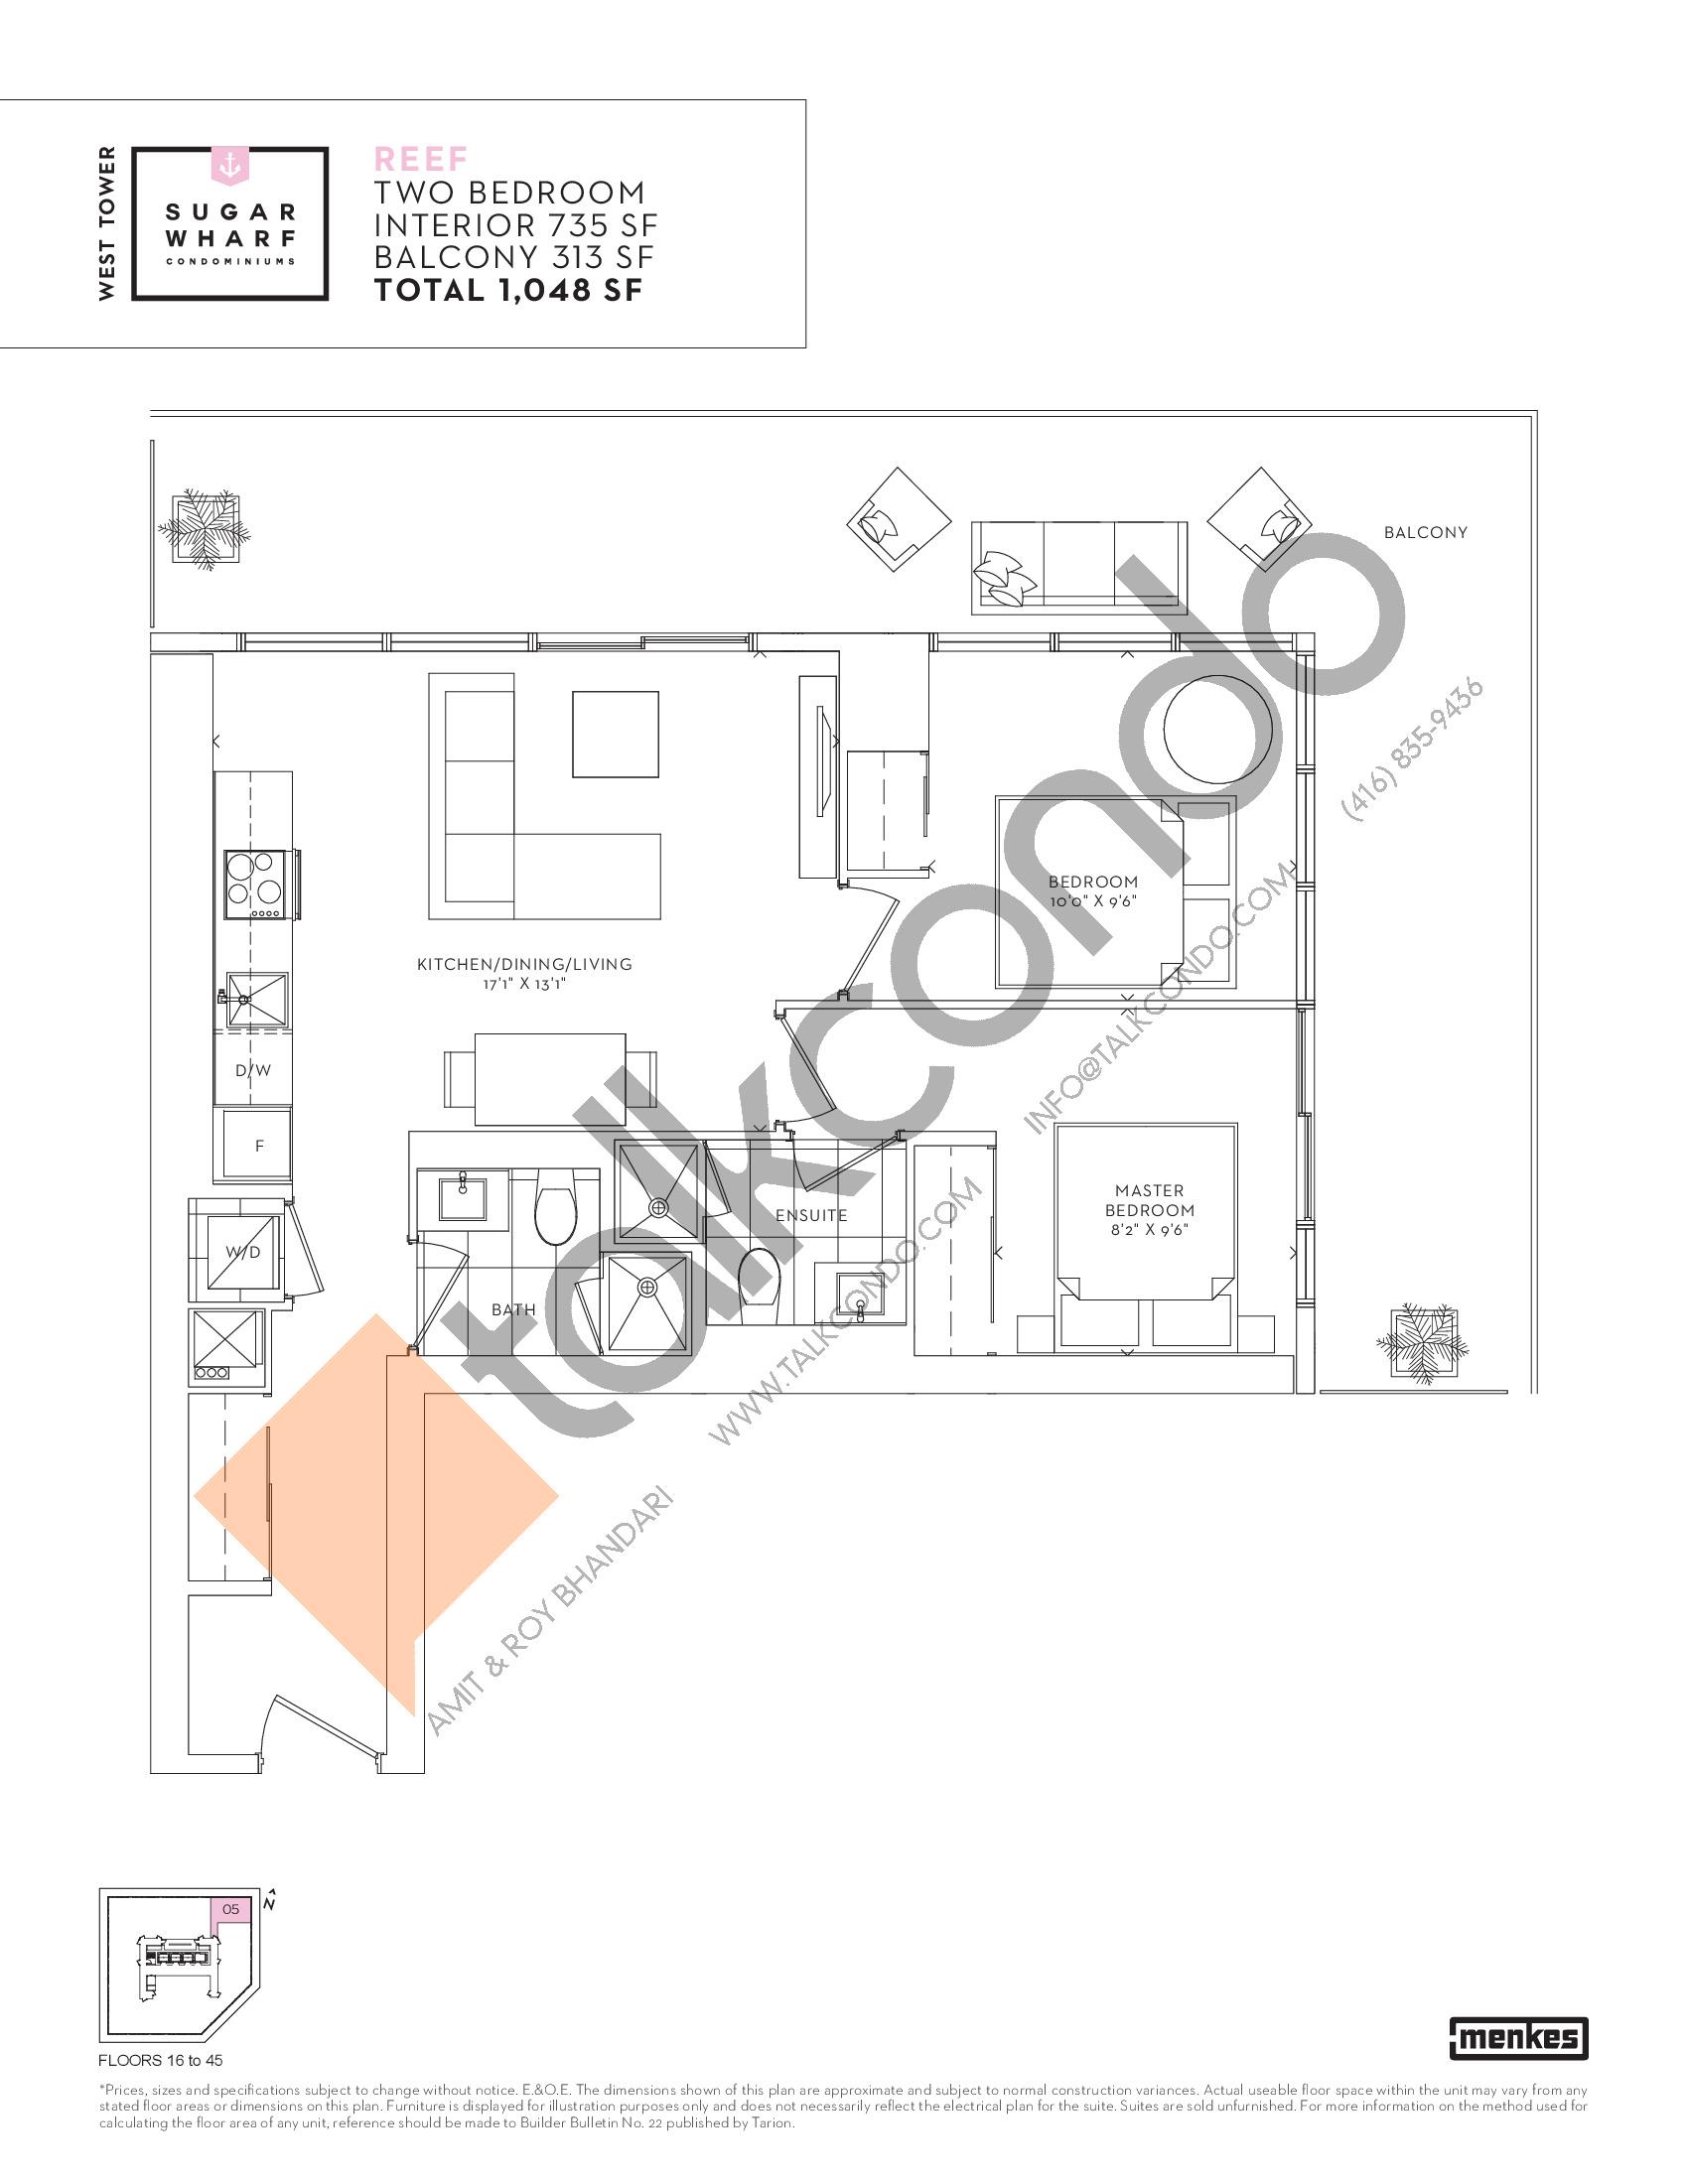 Reef Floor Plan at Sugar Wharf Condos West Tower - 735 sq.ft